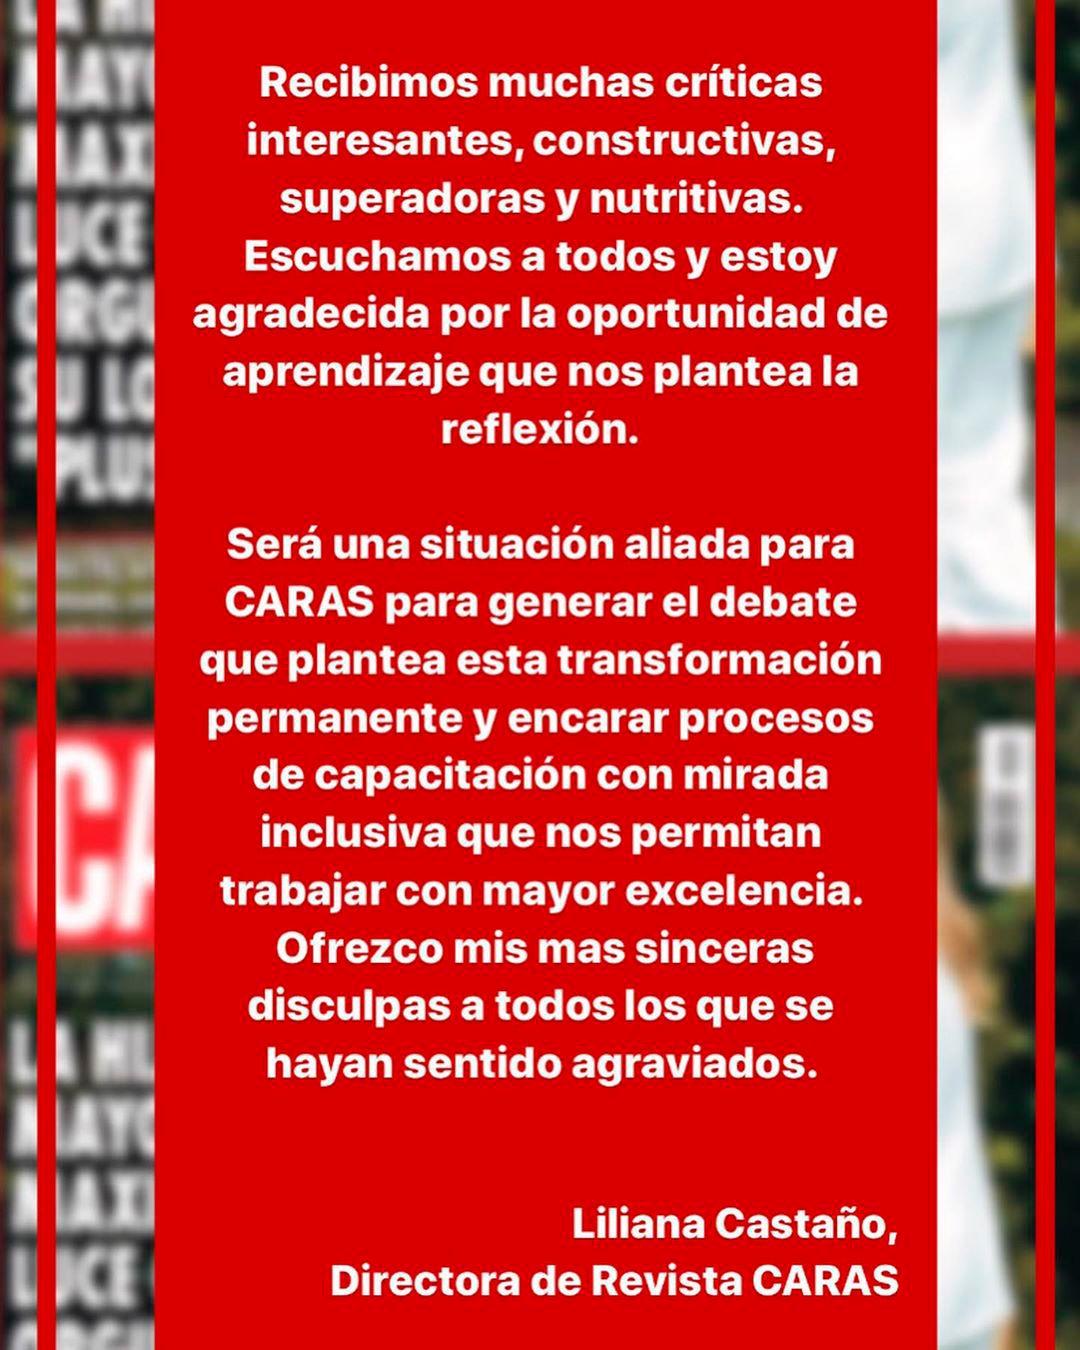 posteo de Revista Caras